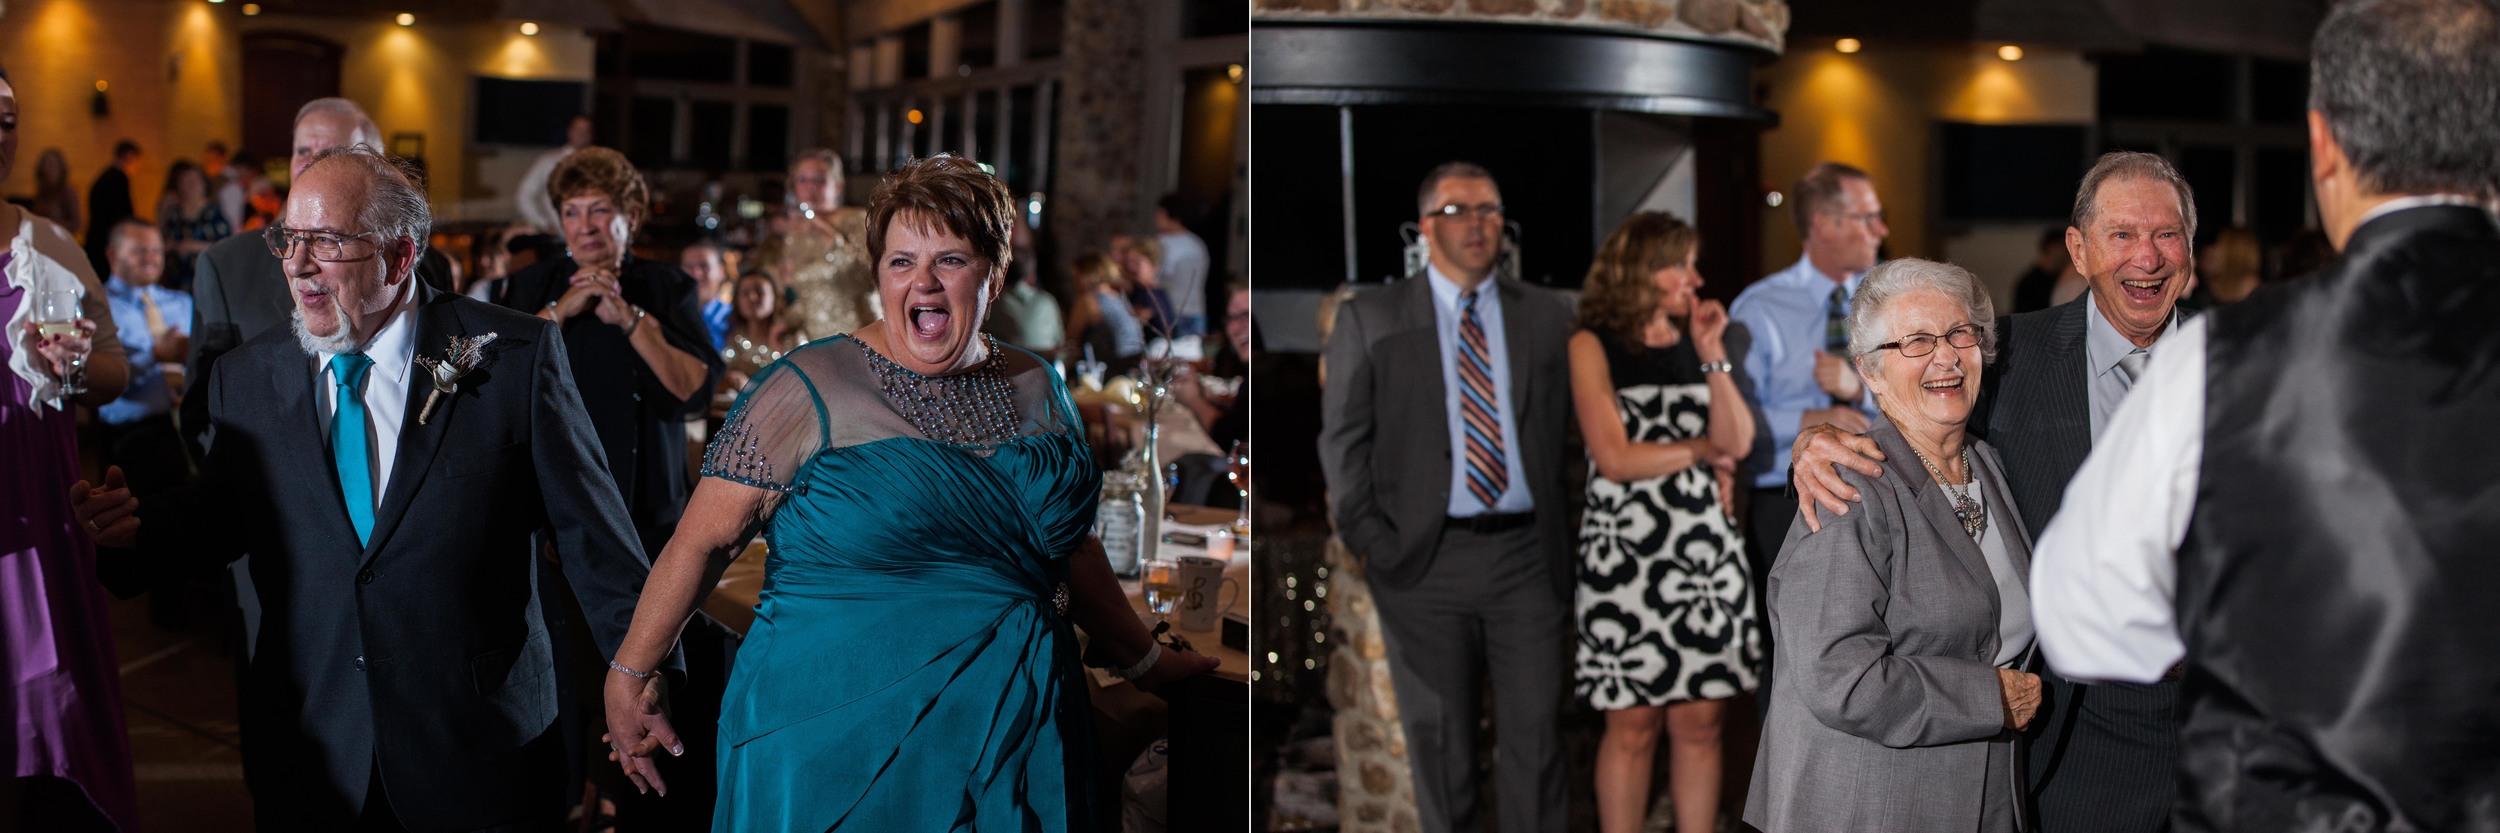 St Louis Wedding Photography-1075 copy.jpg